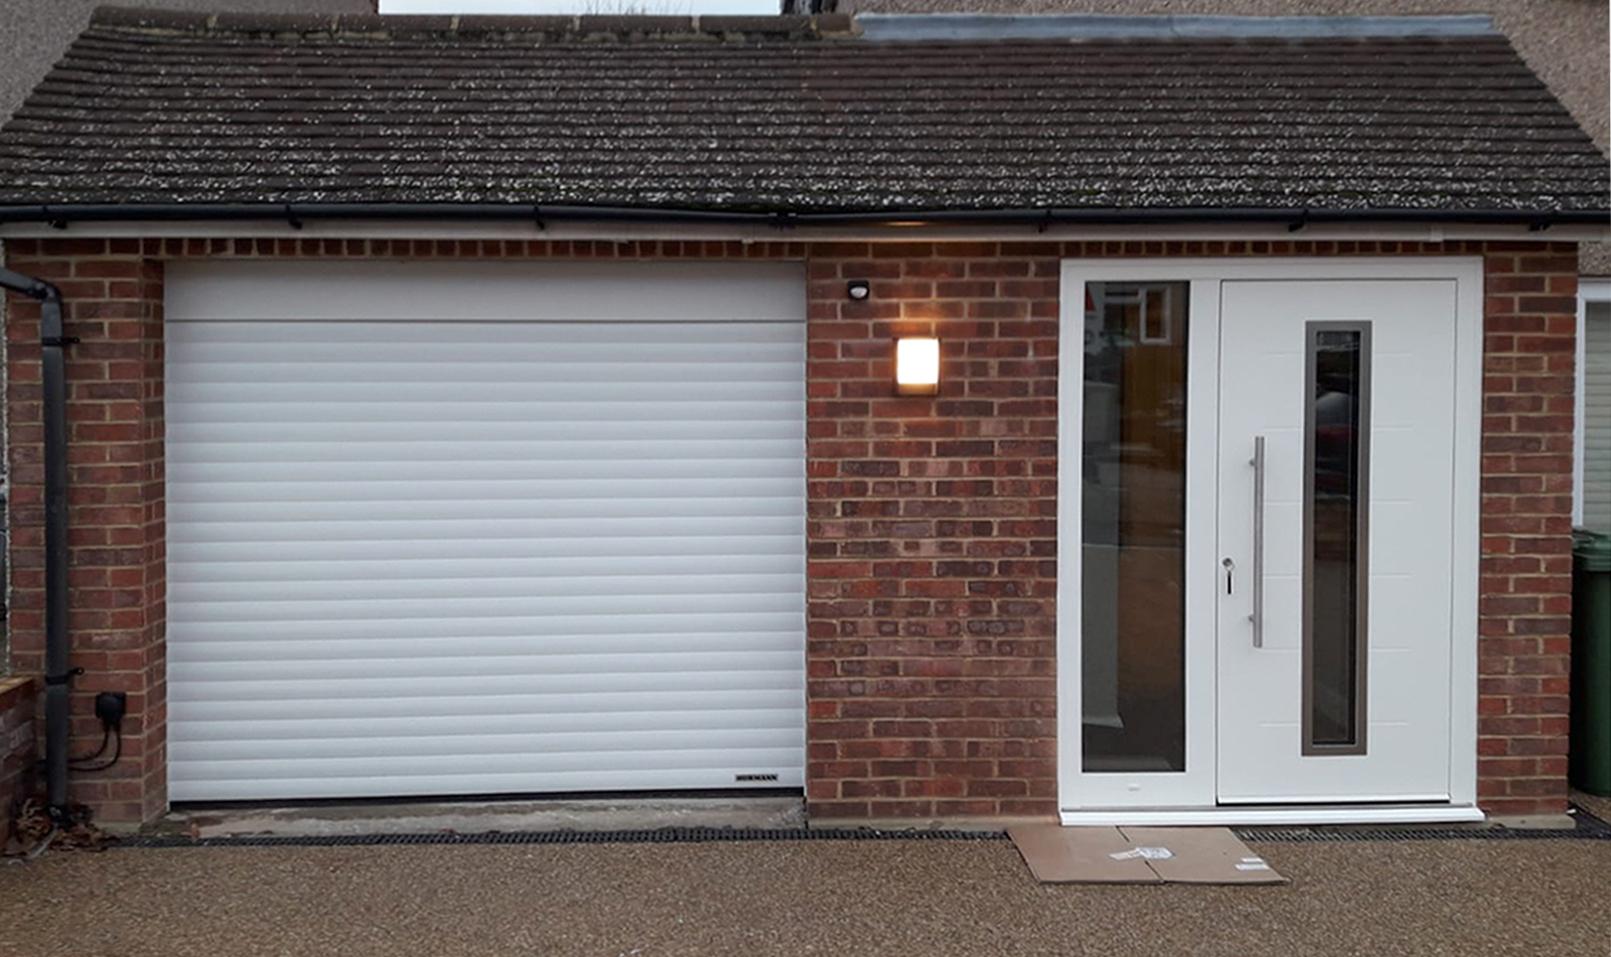 Hormann RollMatic Roller Garage Door & Ryterna RD80 Entrance Door Finished in White